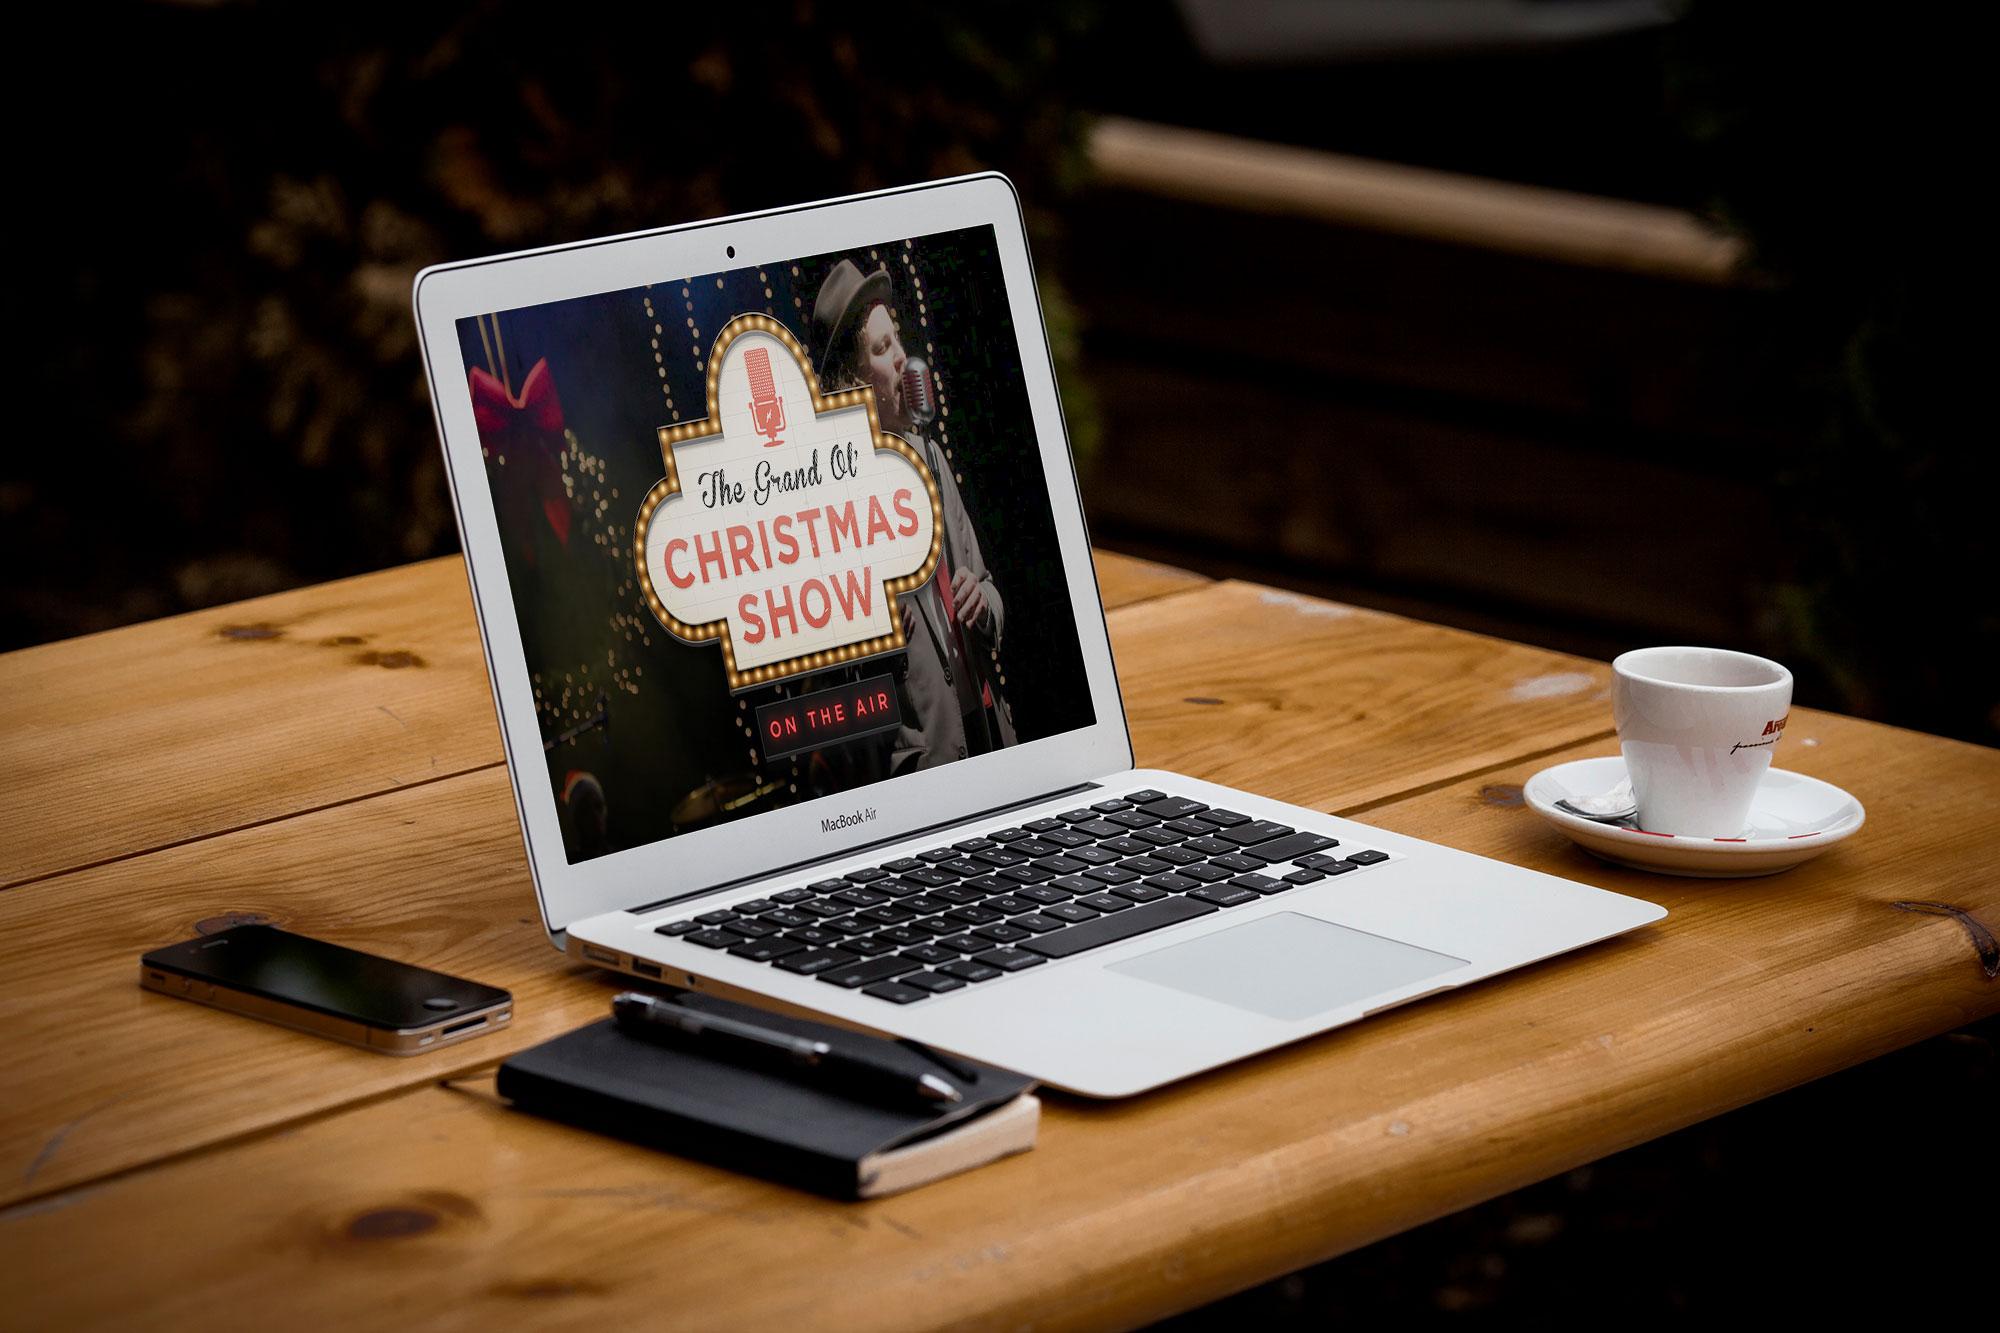 grandolchristmasshow-webdesign